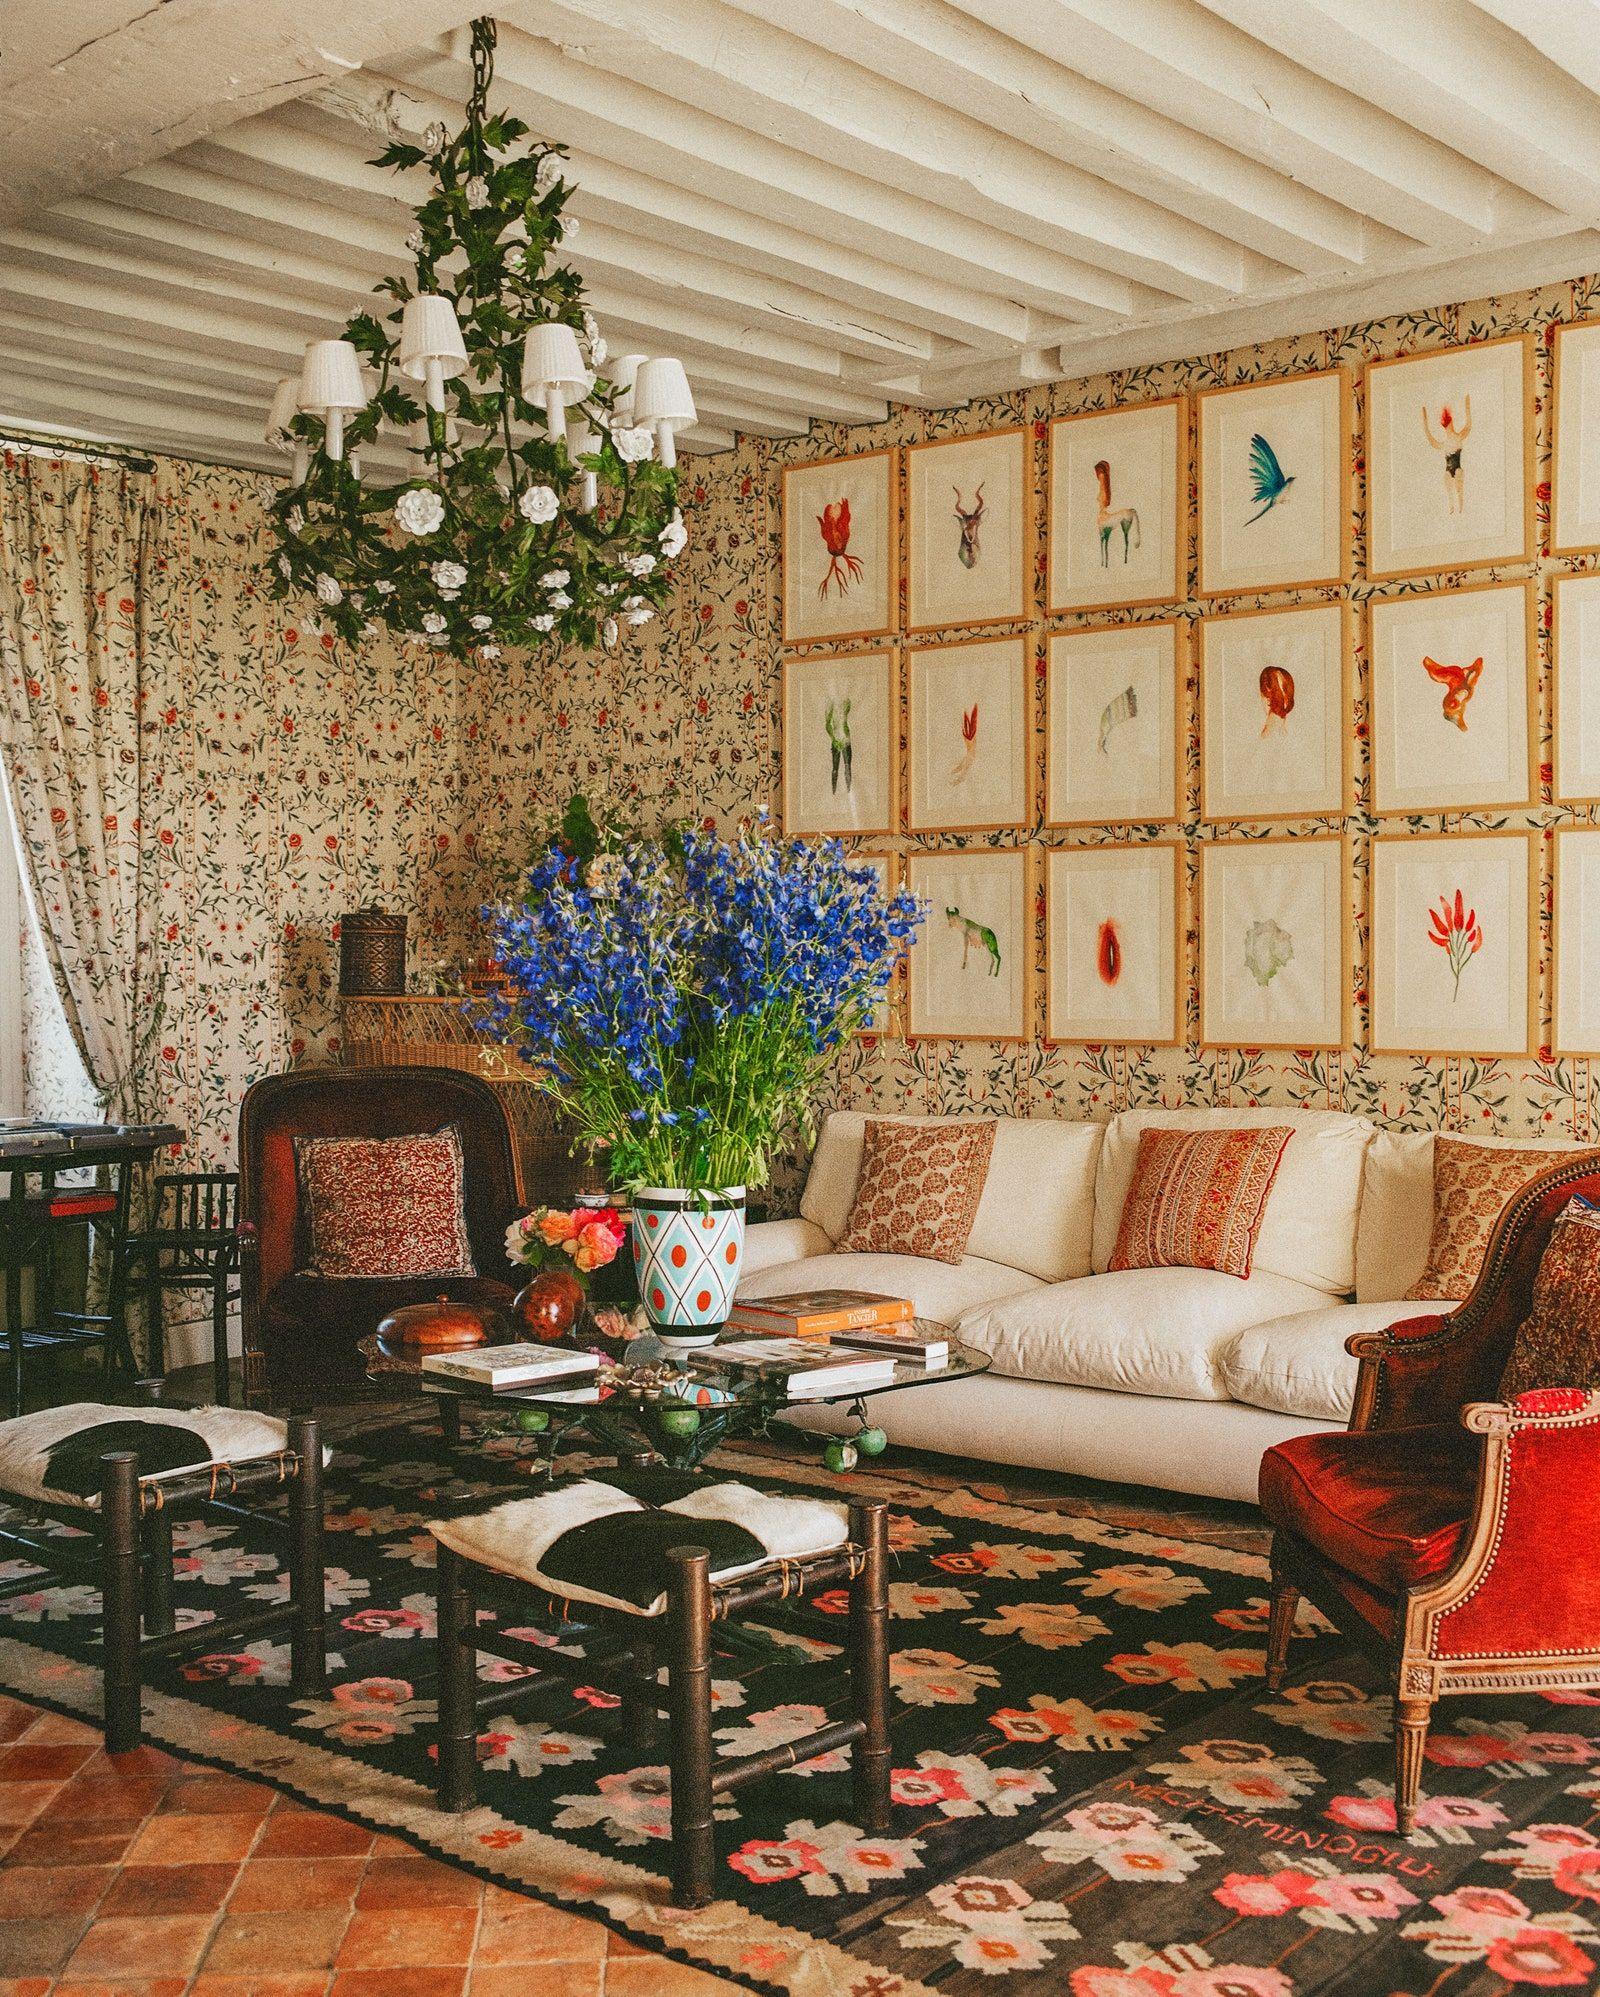 Habitually Chic® » Cordelia de Castellane's French Country Home in ...